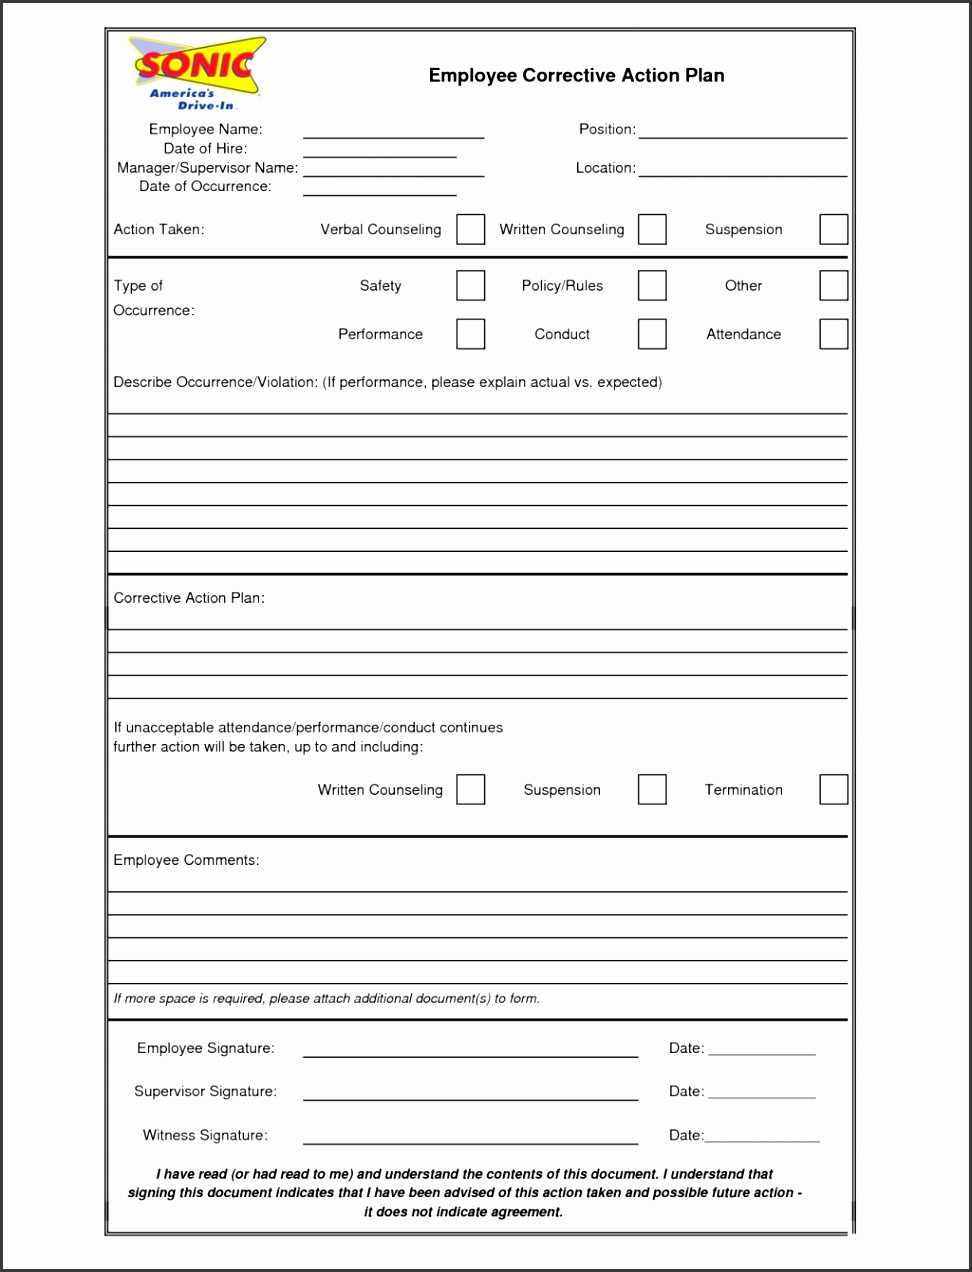 001 Employee Corrective Action Plan Form Template Inside Employee Corrective Action Plan Template